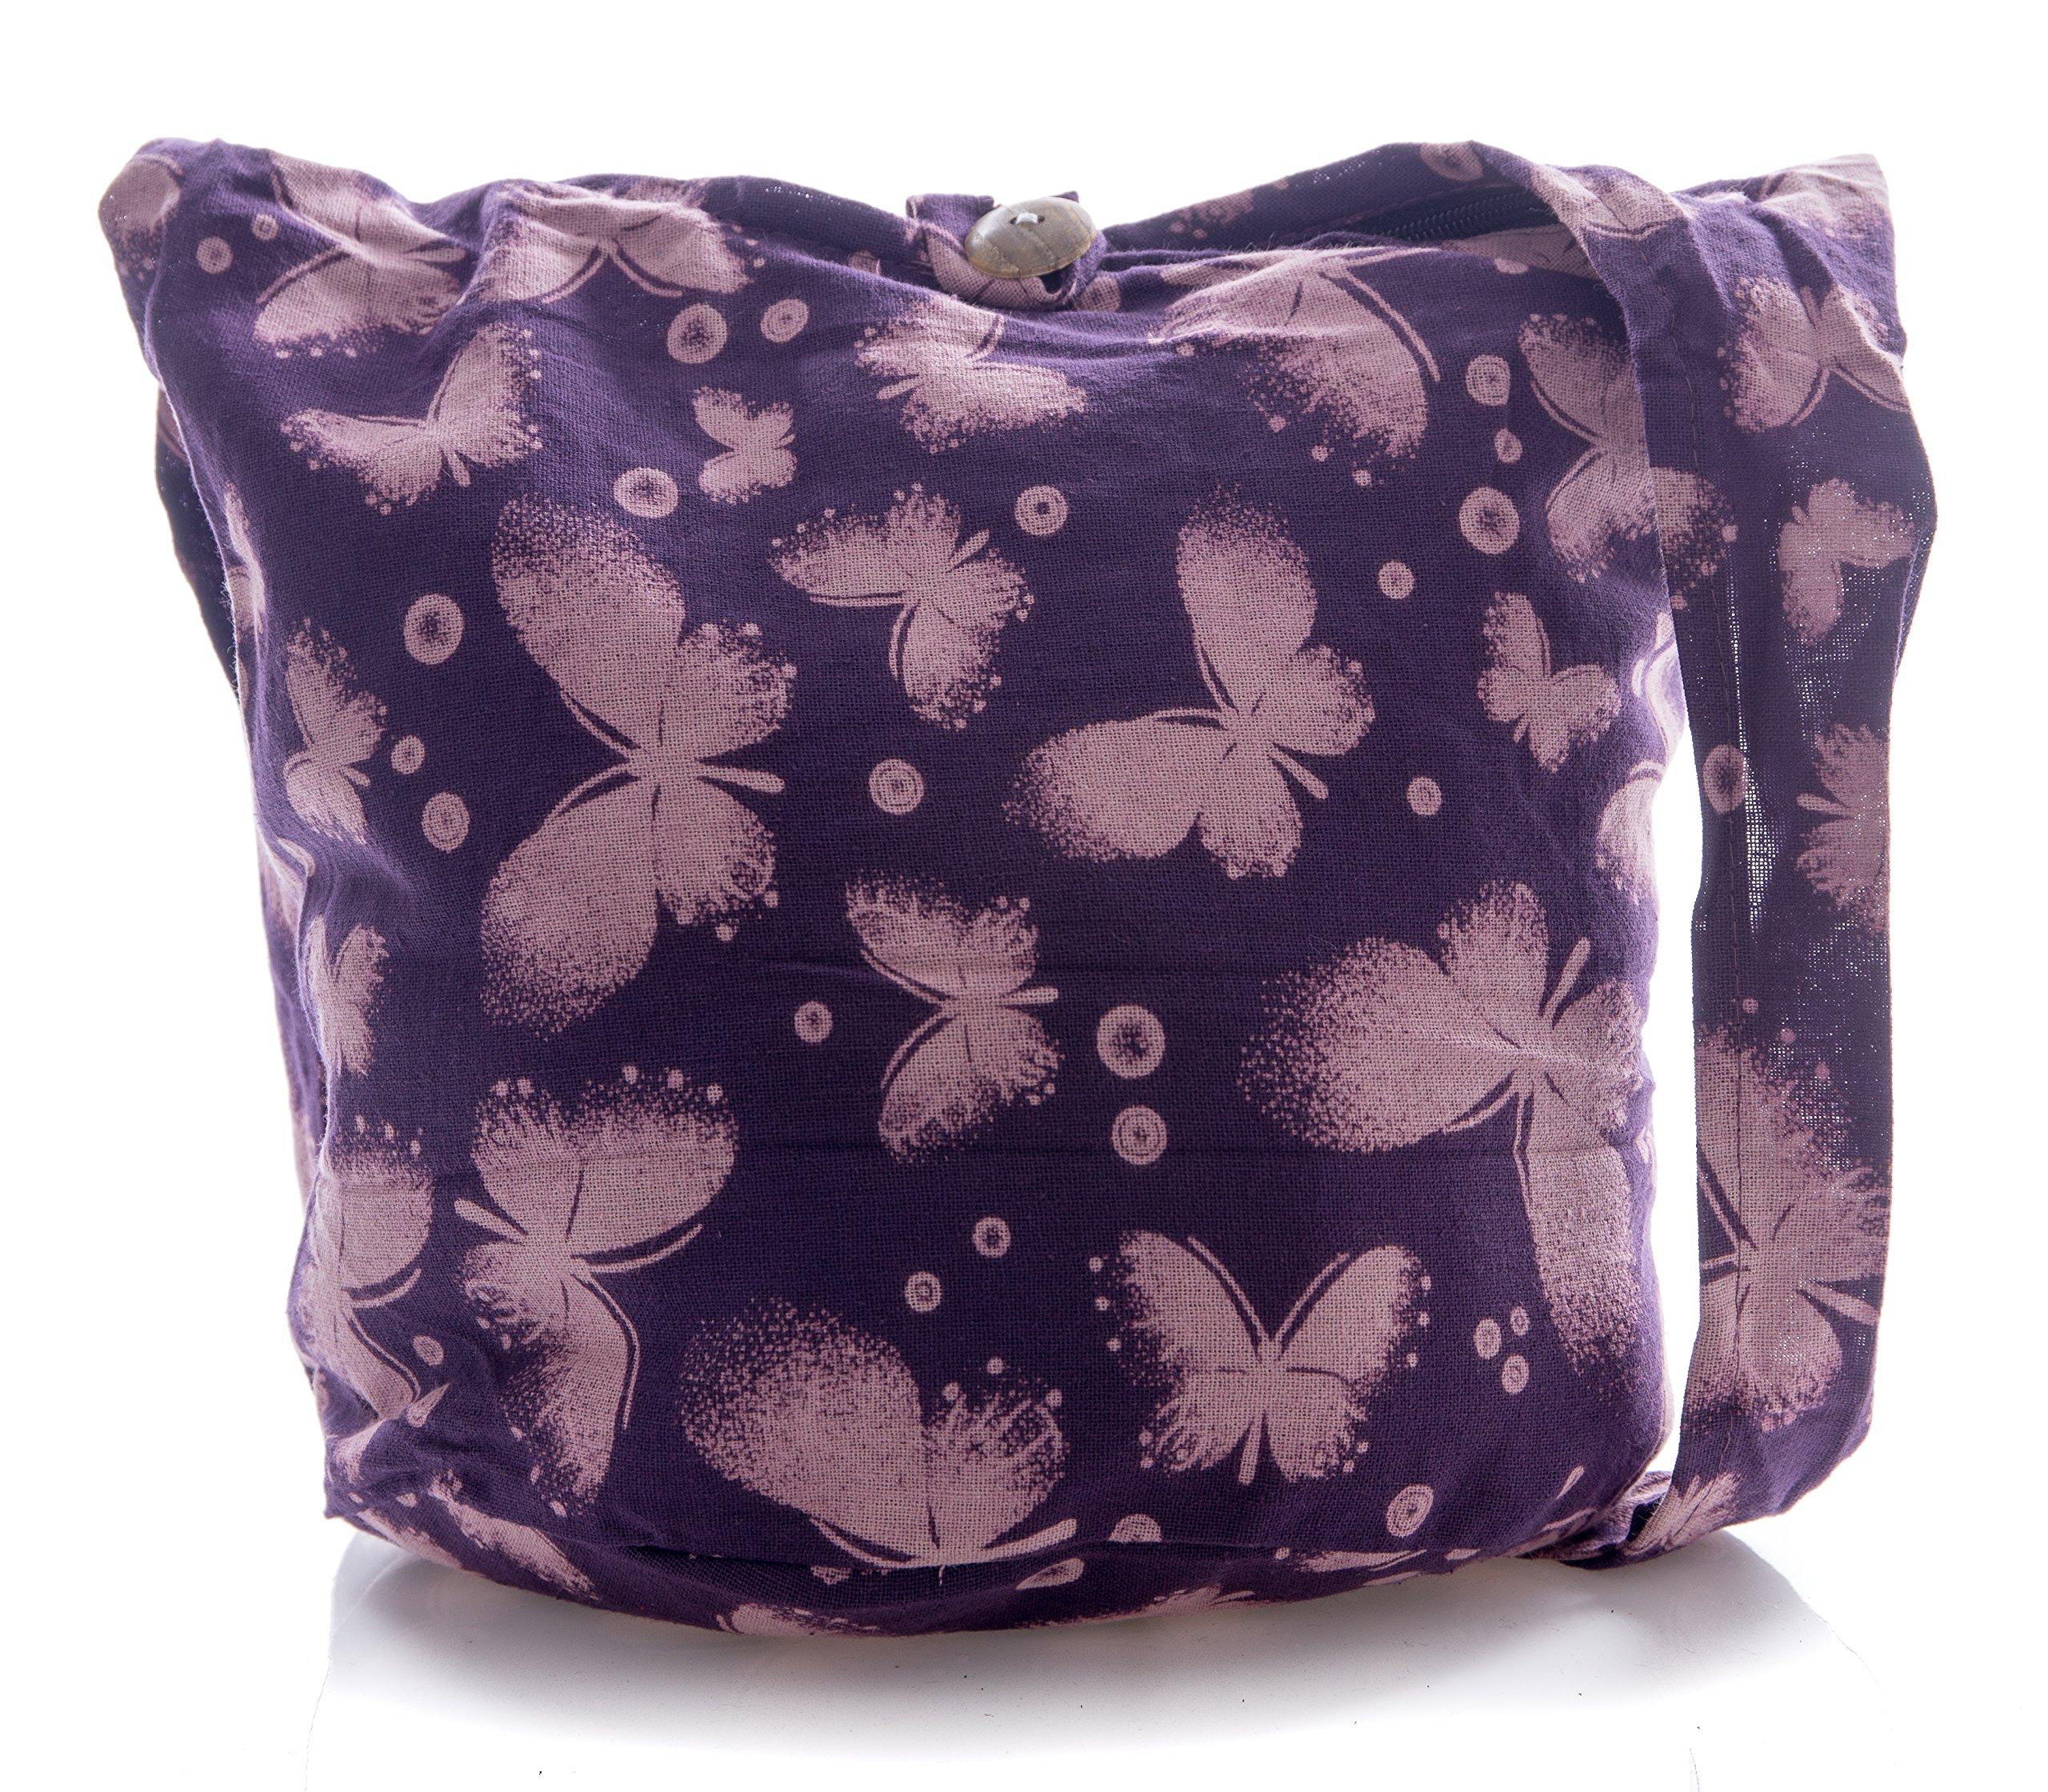 Avarada Thai Cotton Hippie Hobo Sling Crossbody Bag Messenger Purse Bohemian Butterfly